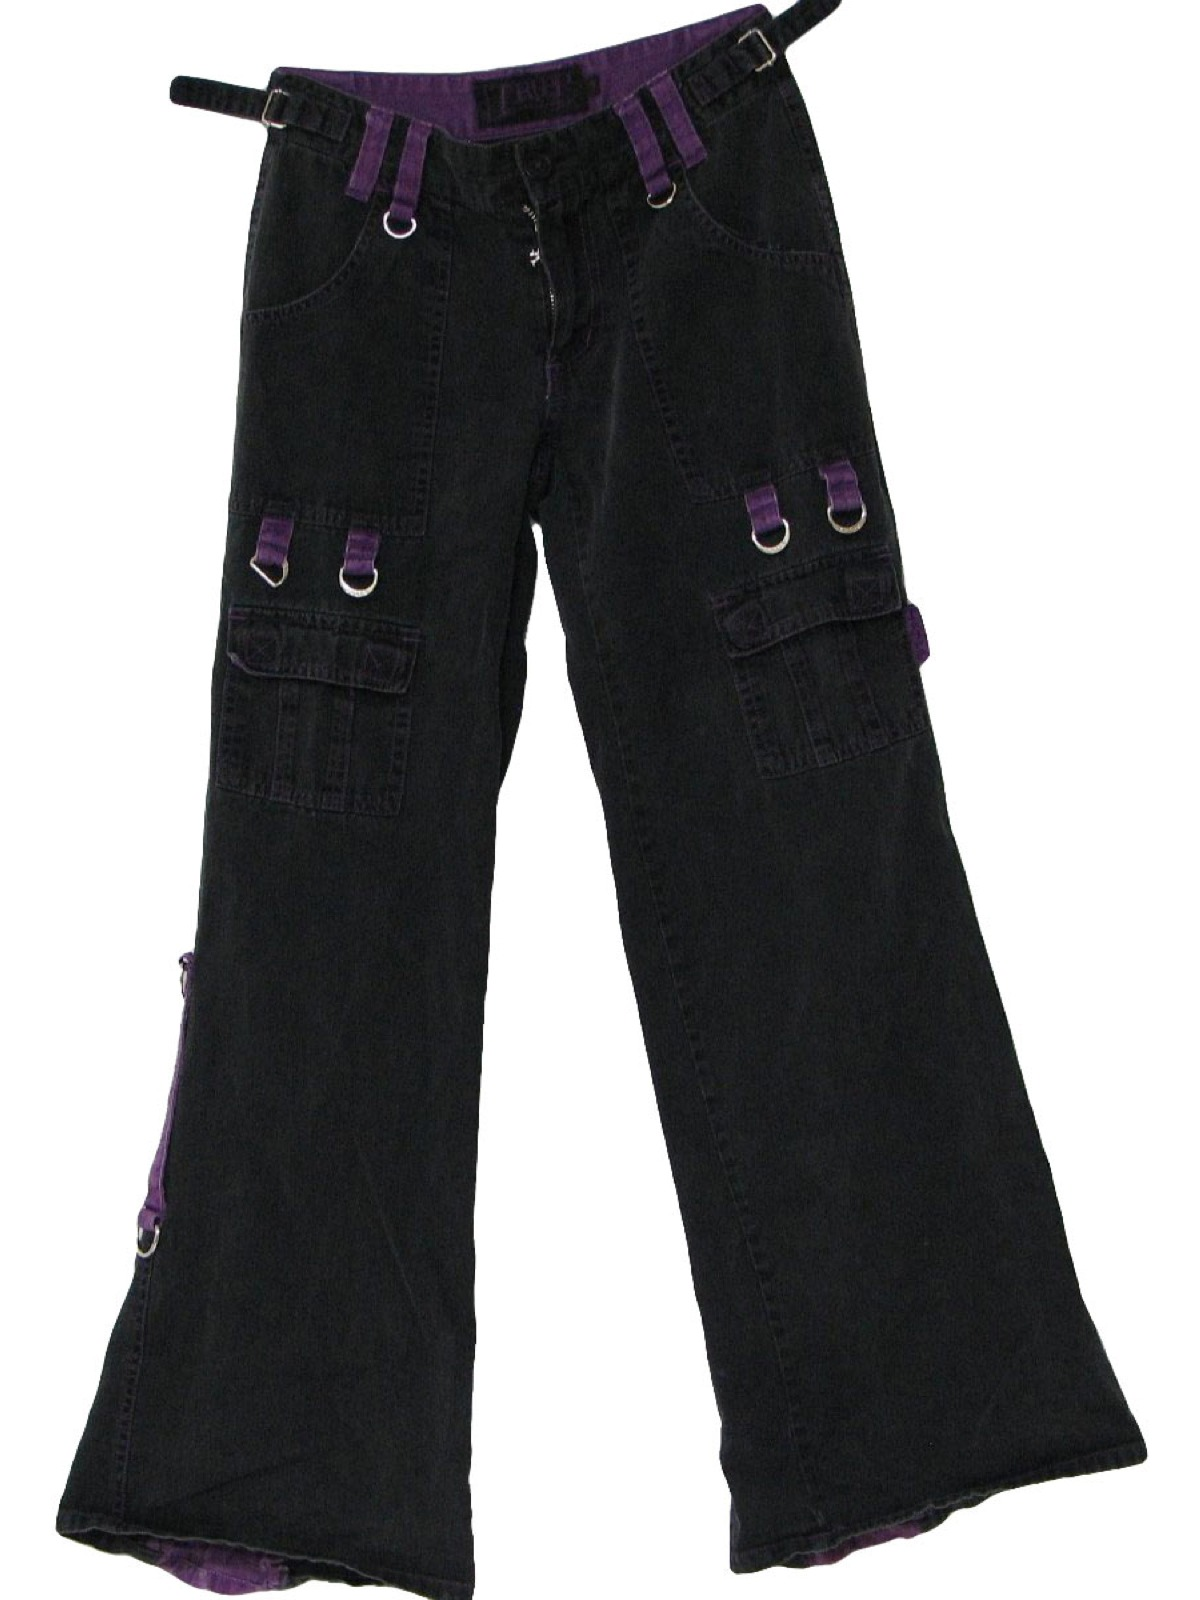 Elegant Retro 199039s Pants Tripp  90sTripp Womens Faded Black And Cheetah